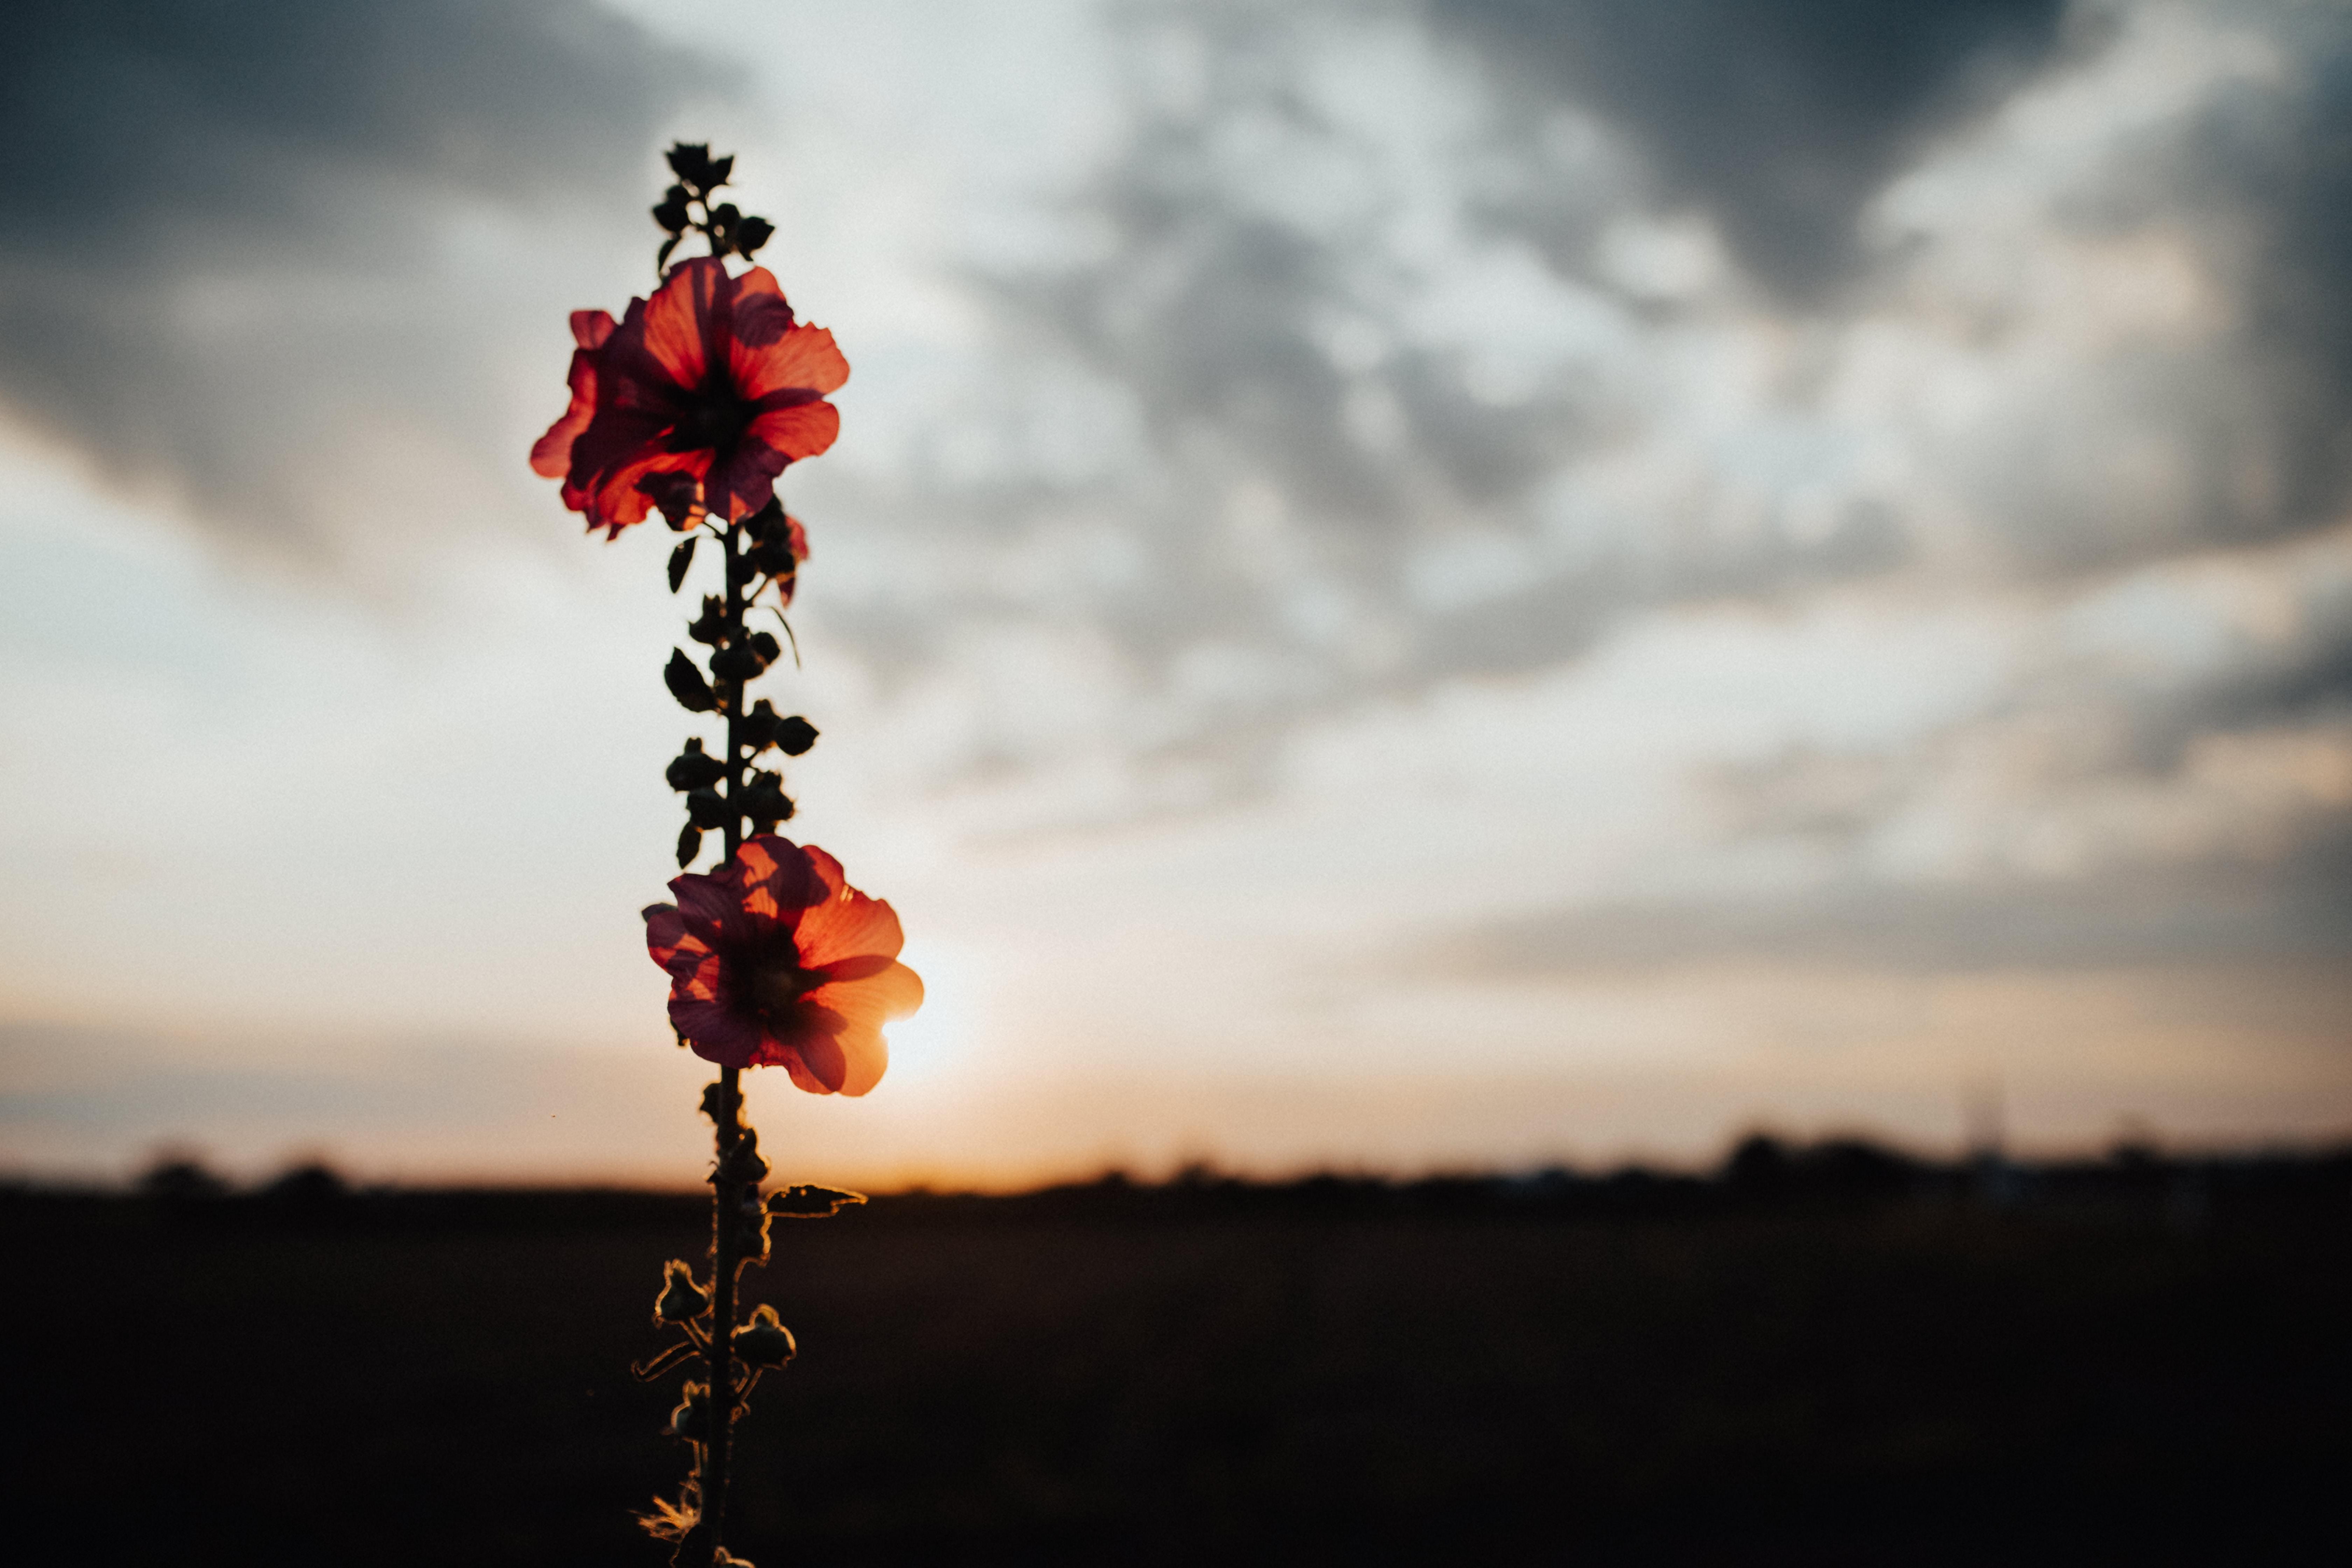 silhouette photo of poppy flower